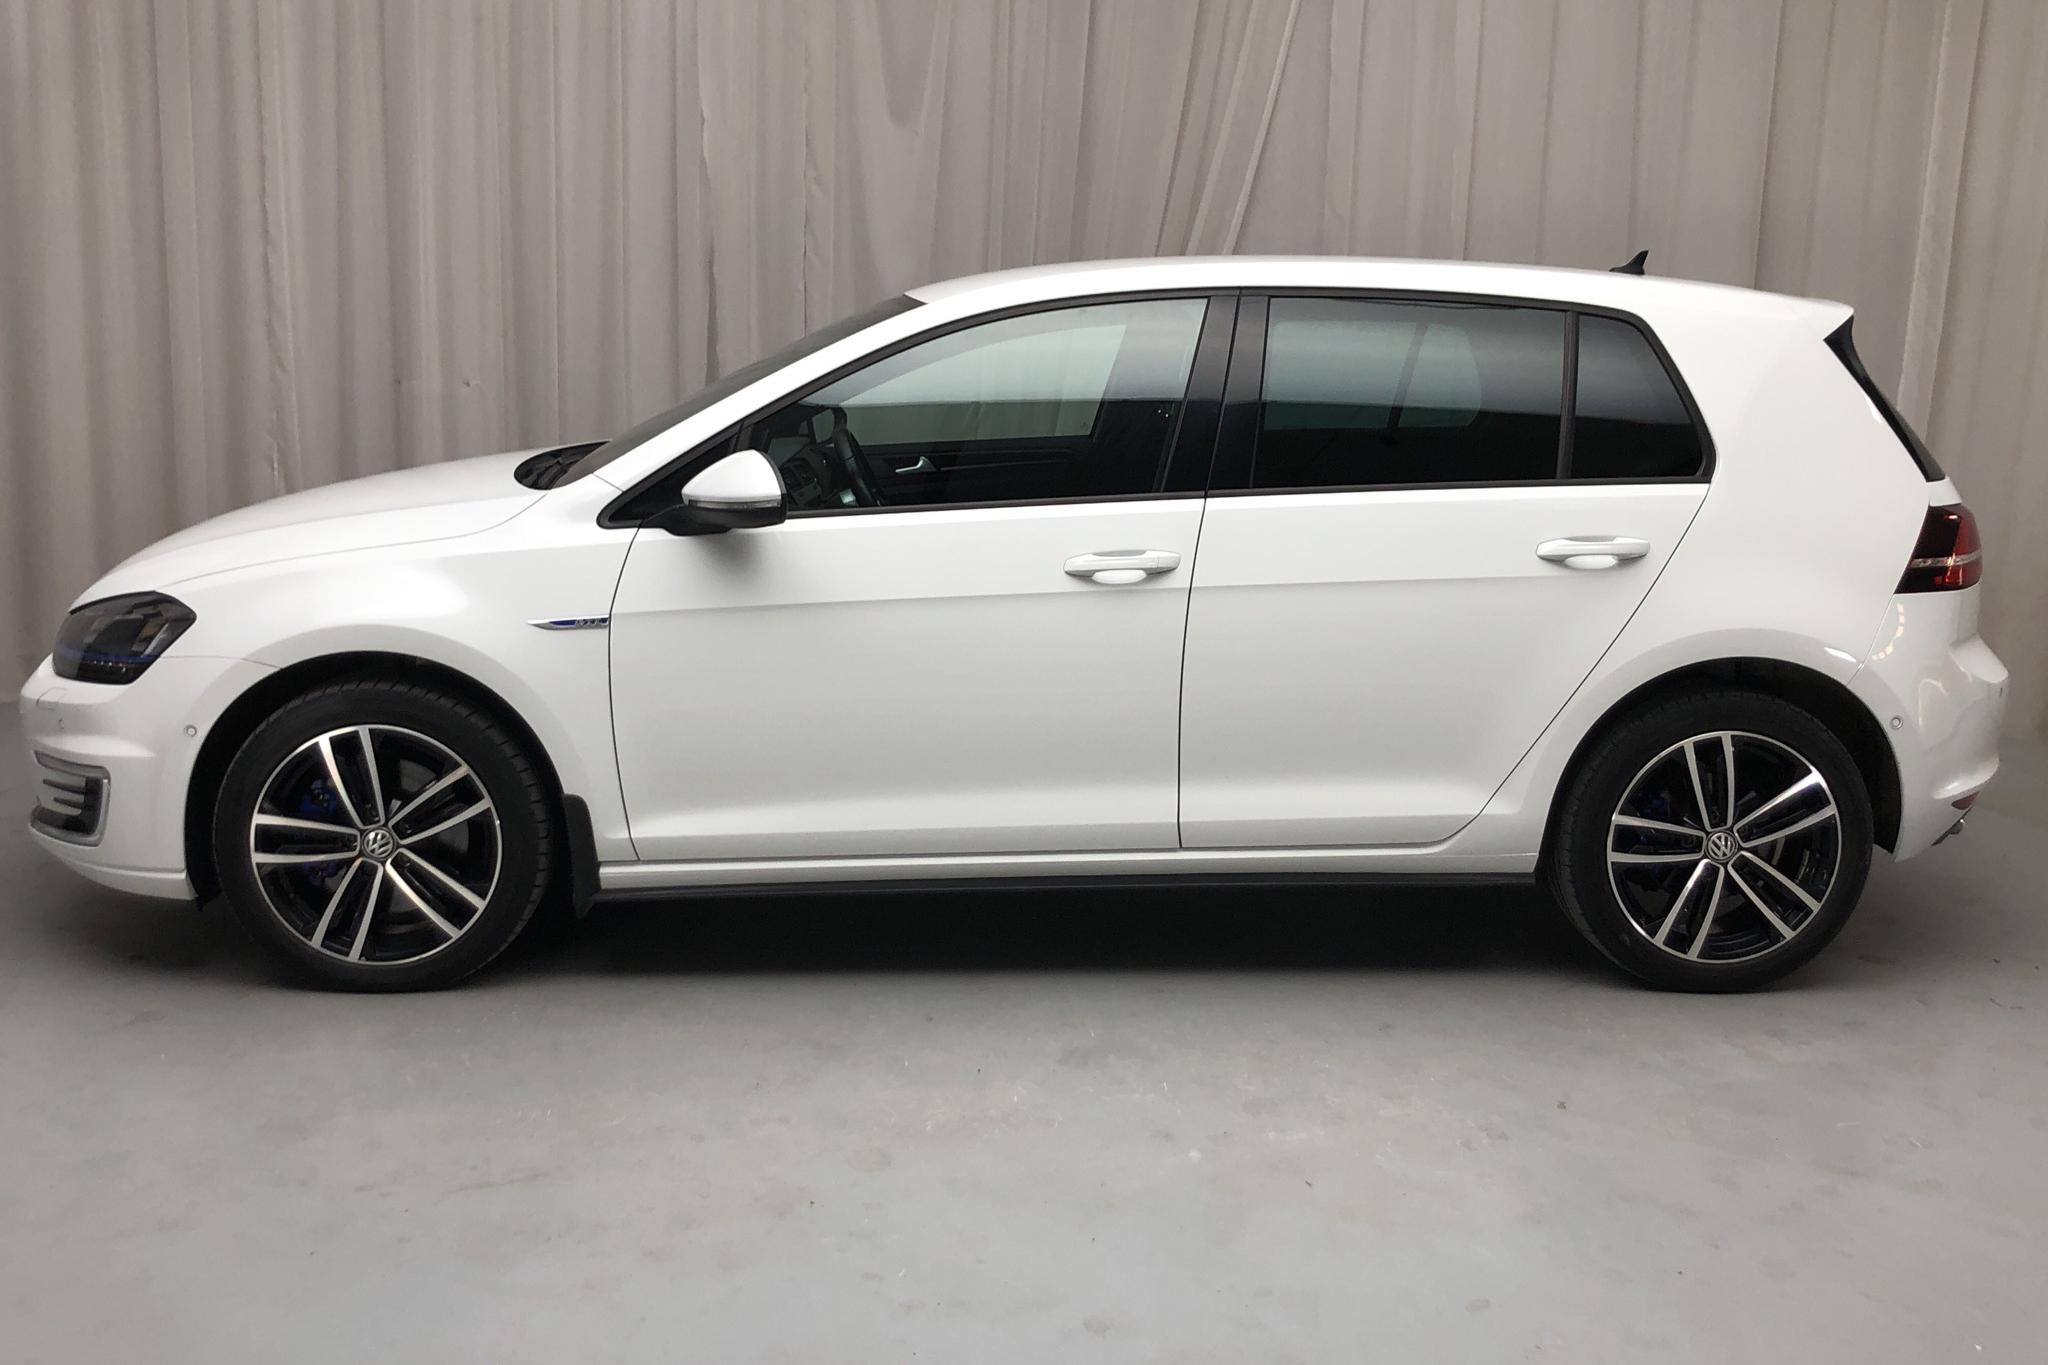 VW Golf VII 1.4 Plug-in-Hybrid 5dr (204hk) - 8 554 mil - Automat - vit - 2016